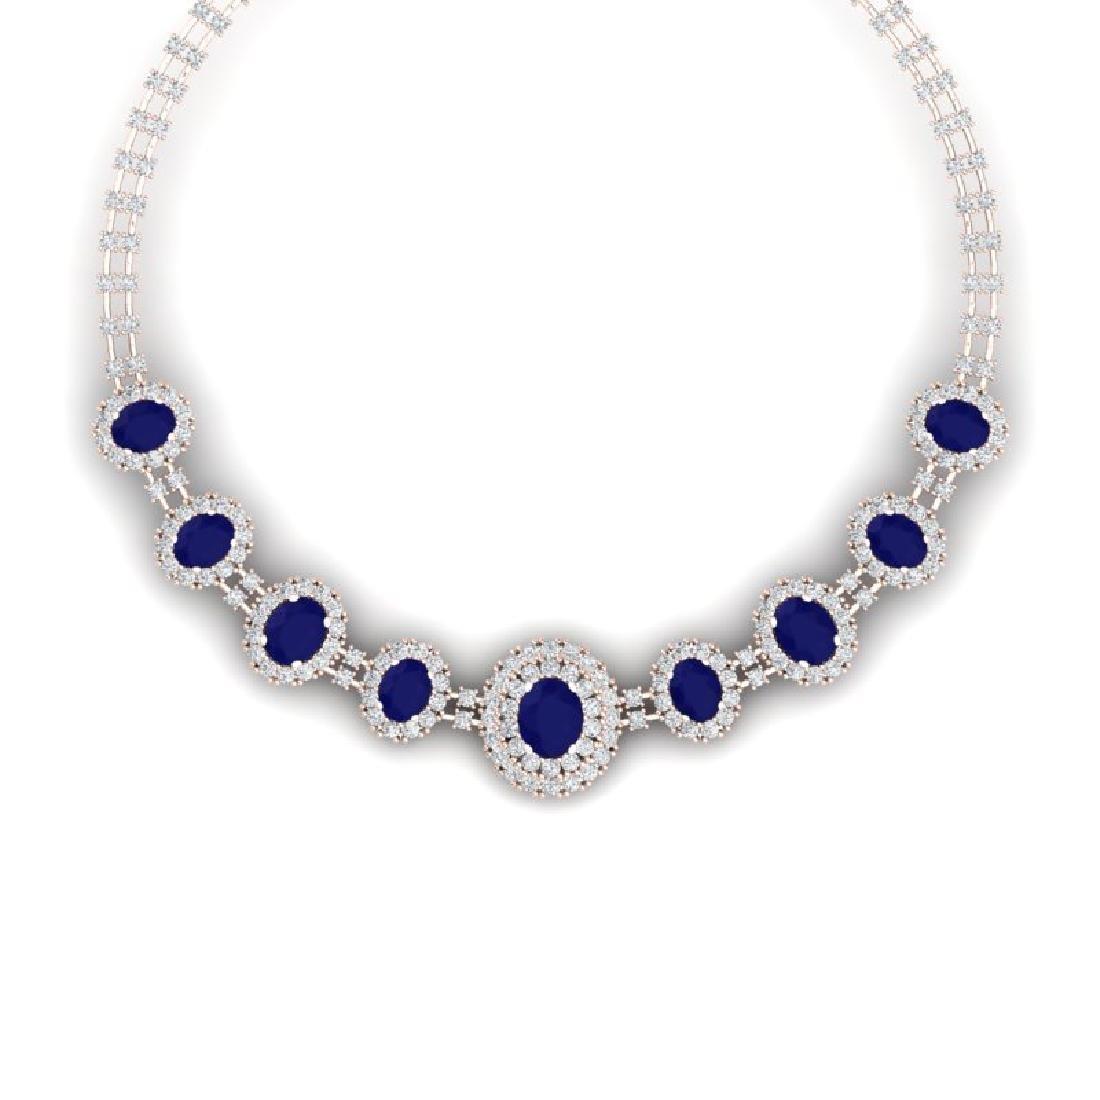 45.69 CTW Royalty Sapphire & VS Diamond Necklace 18K